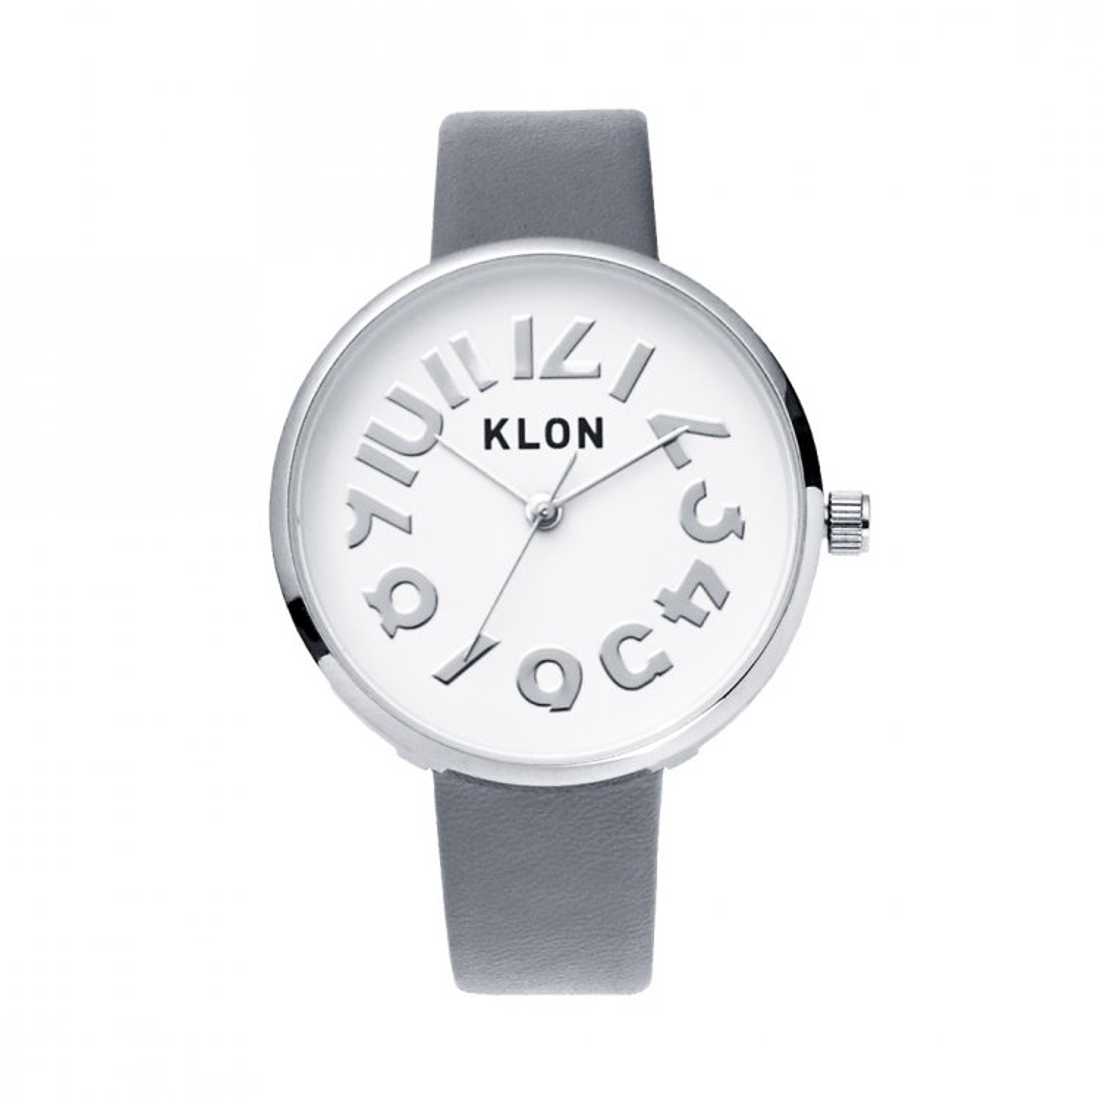 KLON HIDE TIME GRAY Ver.SILVER 33mm